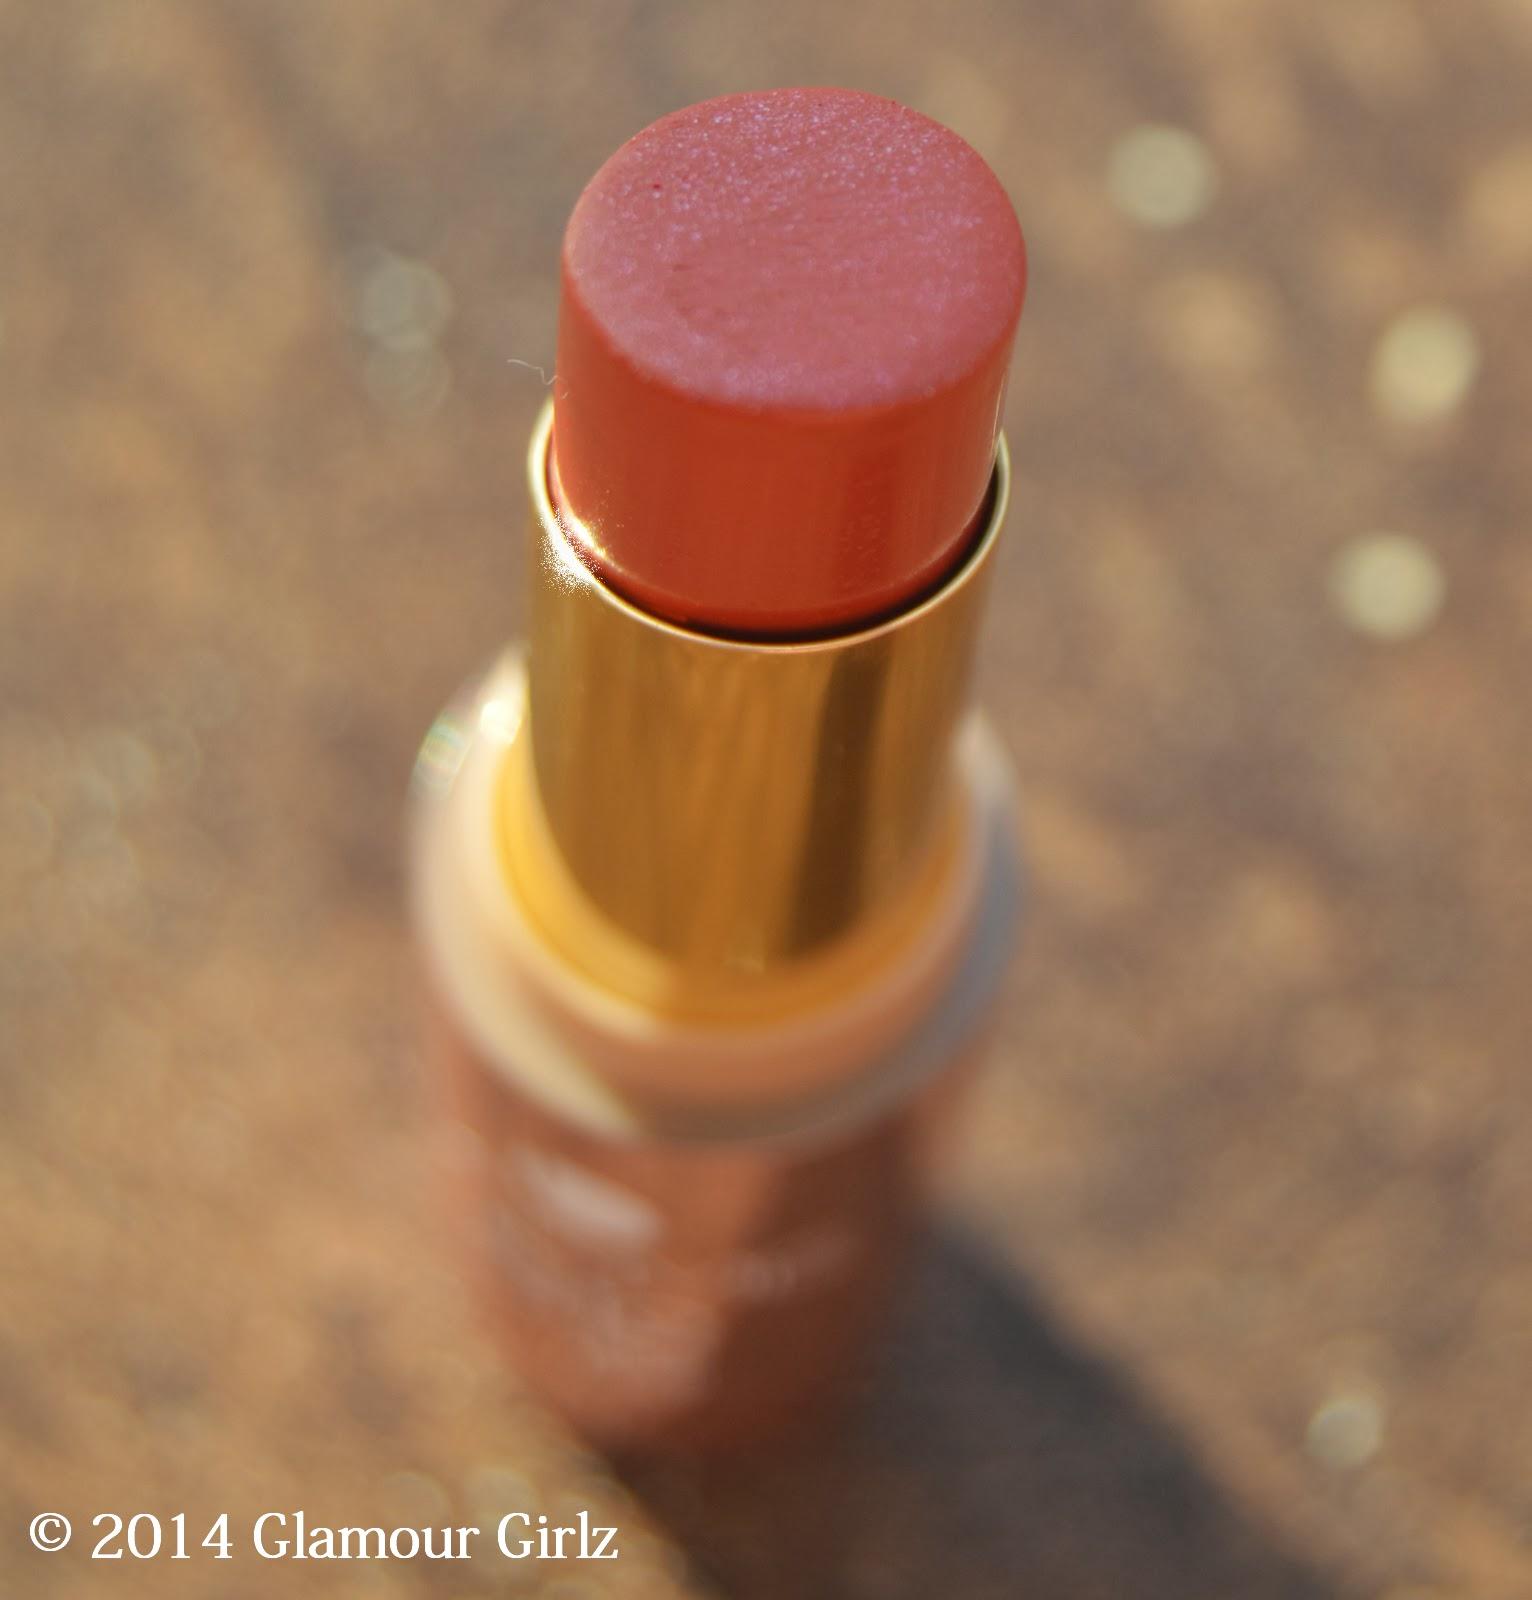 Roseate Motive, Lakme 9 to 5 lipstick.